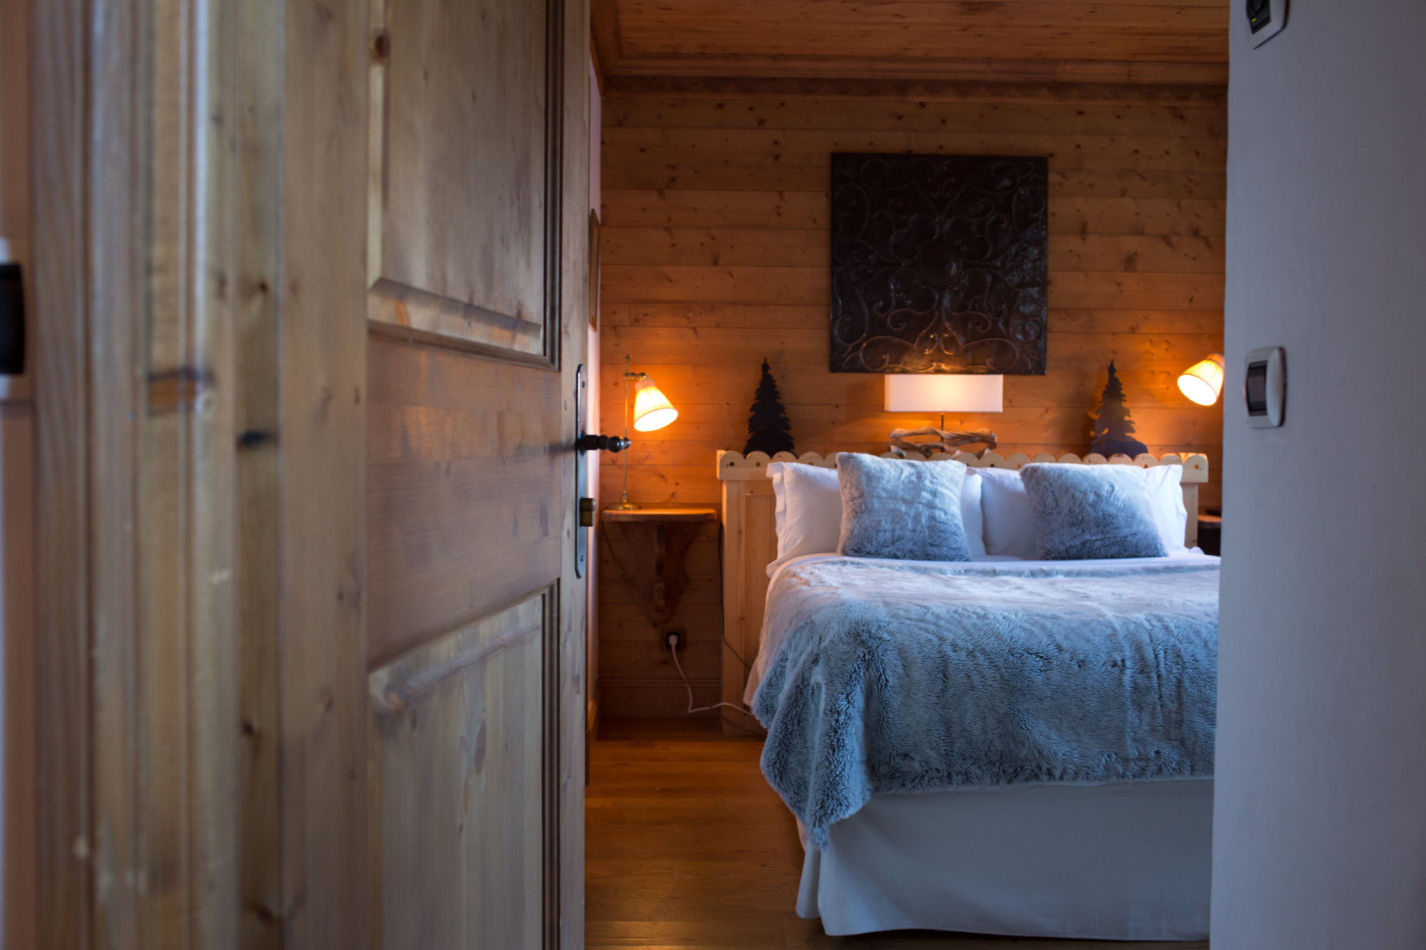 hermine-bedroom-image-3